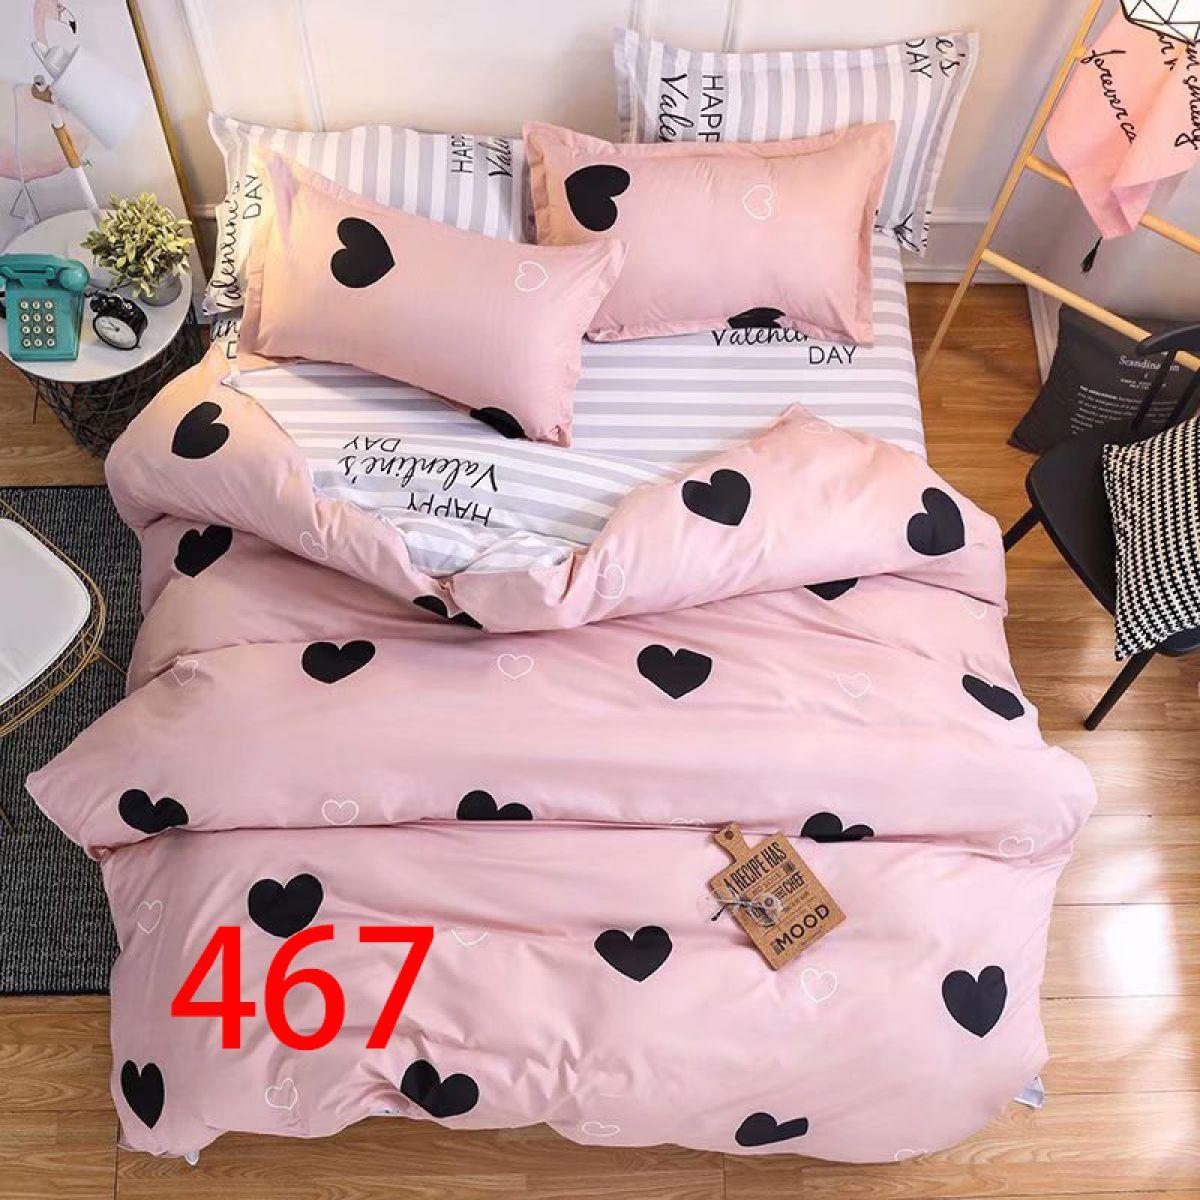 3D Beddings - Antonio - AML-4248 - 140x200 cm - 2 pcs